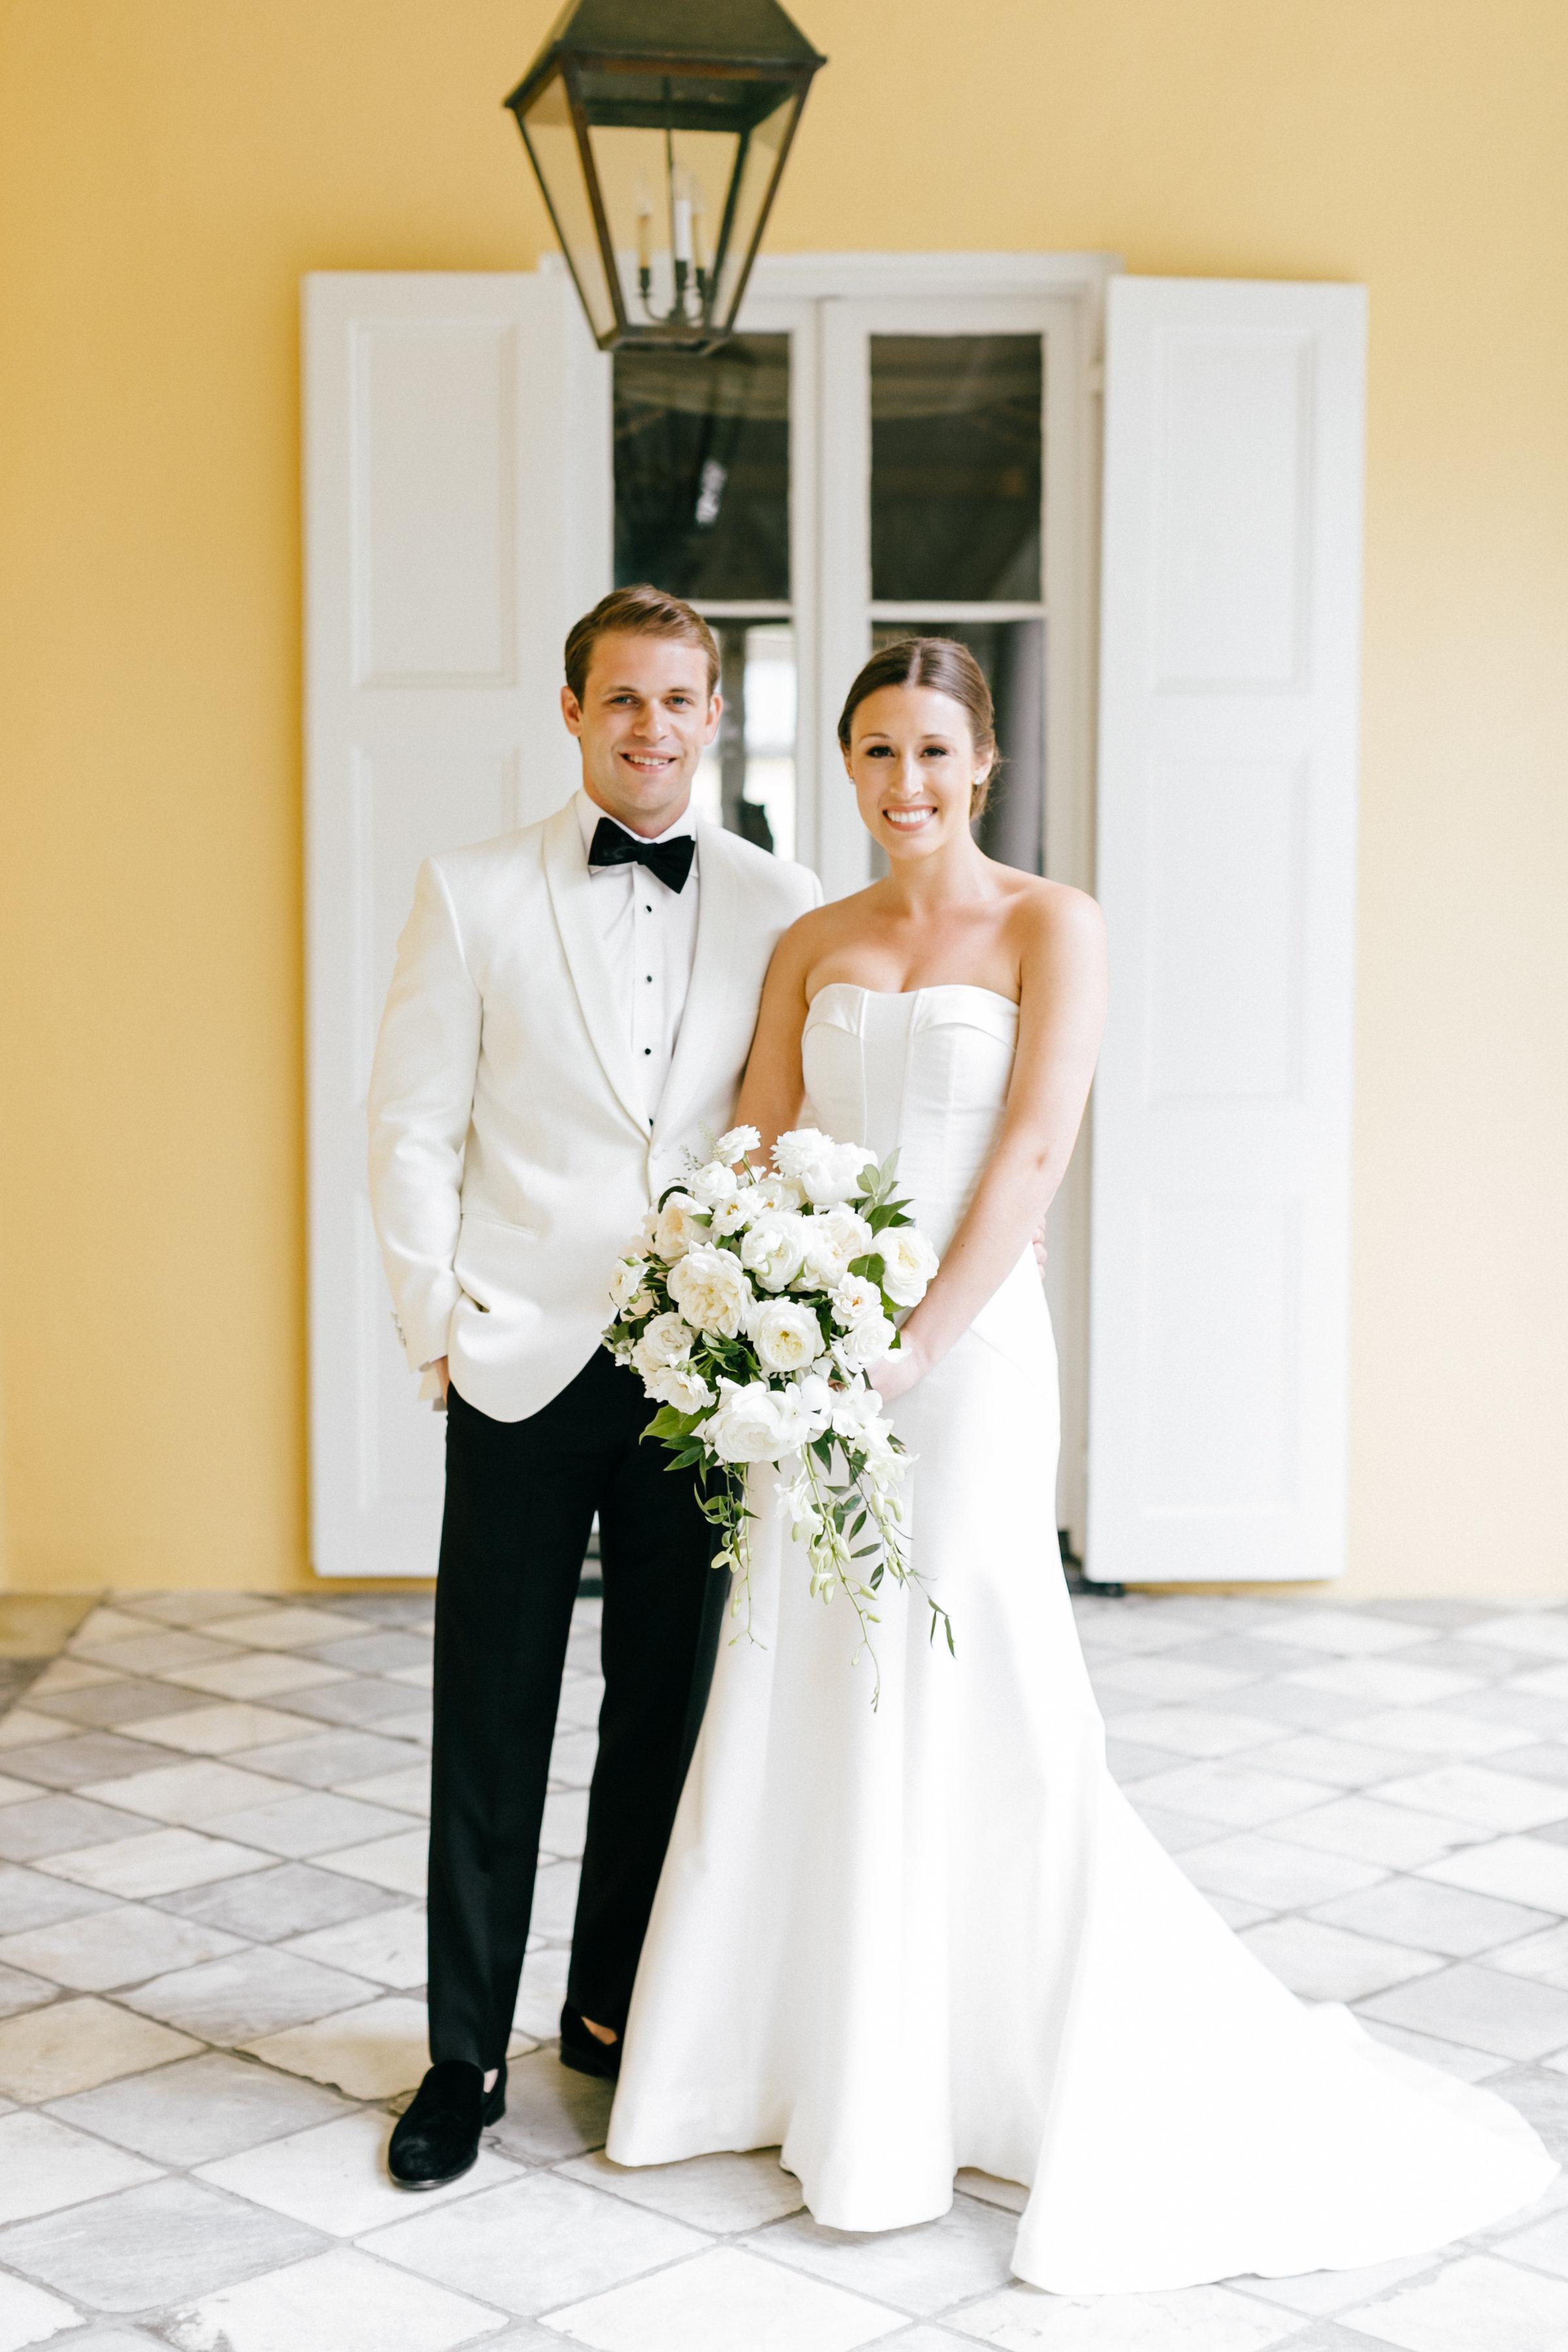 doloughty-wedding-184.jpg